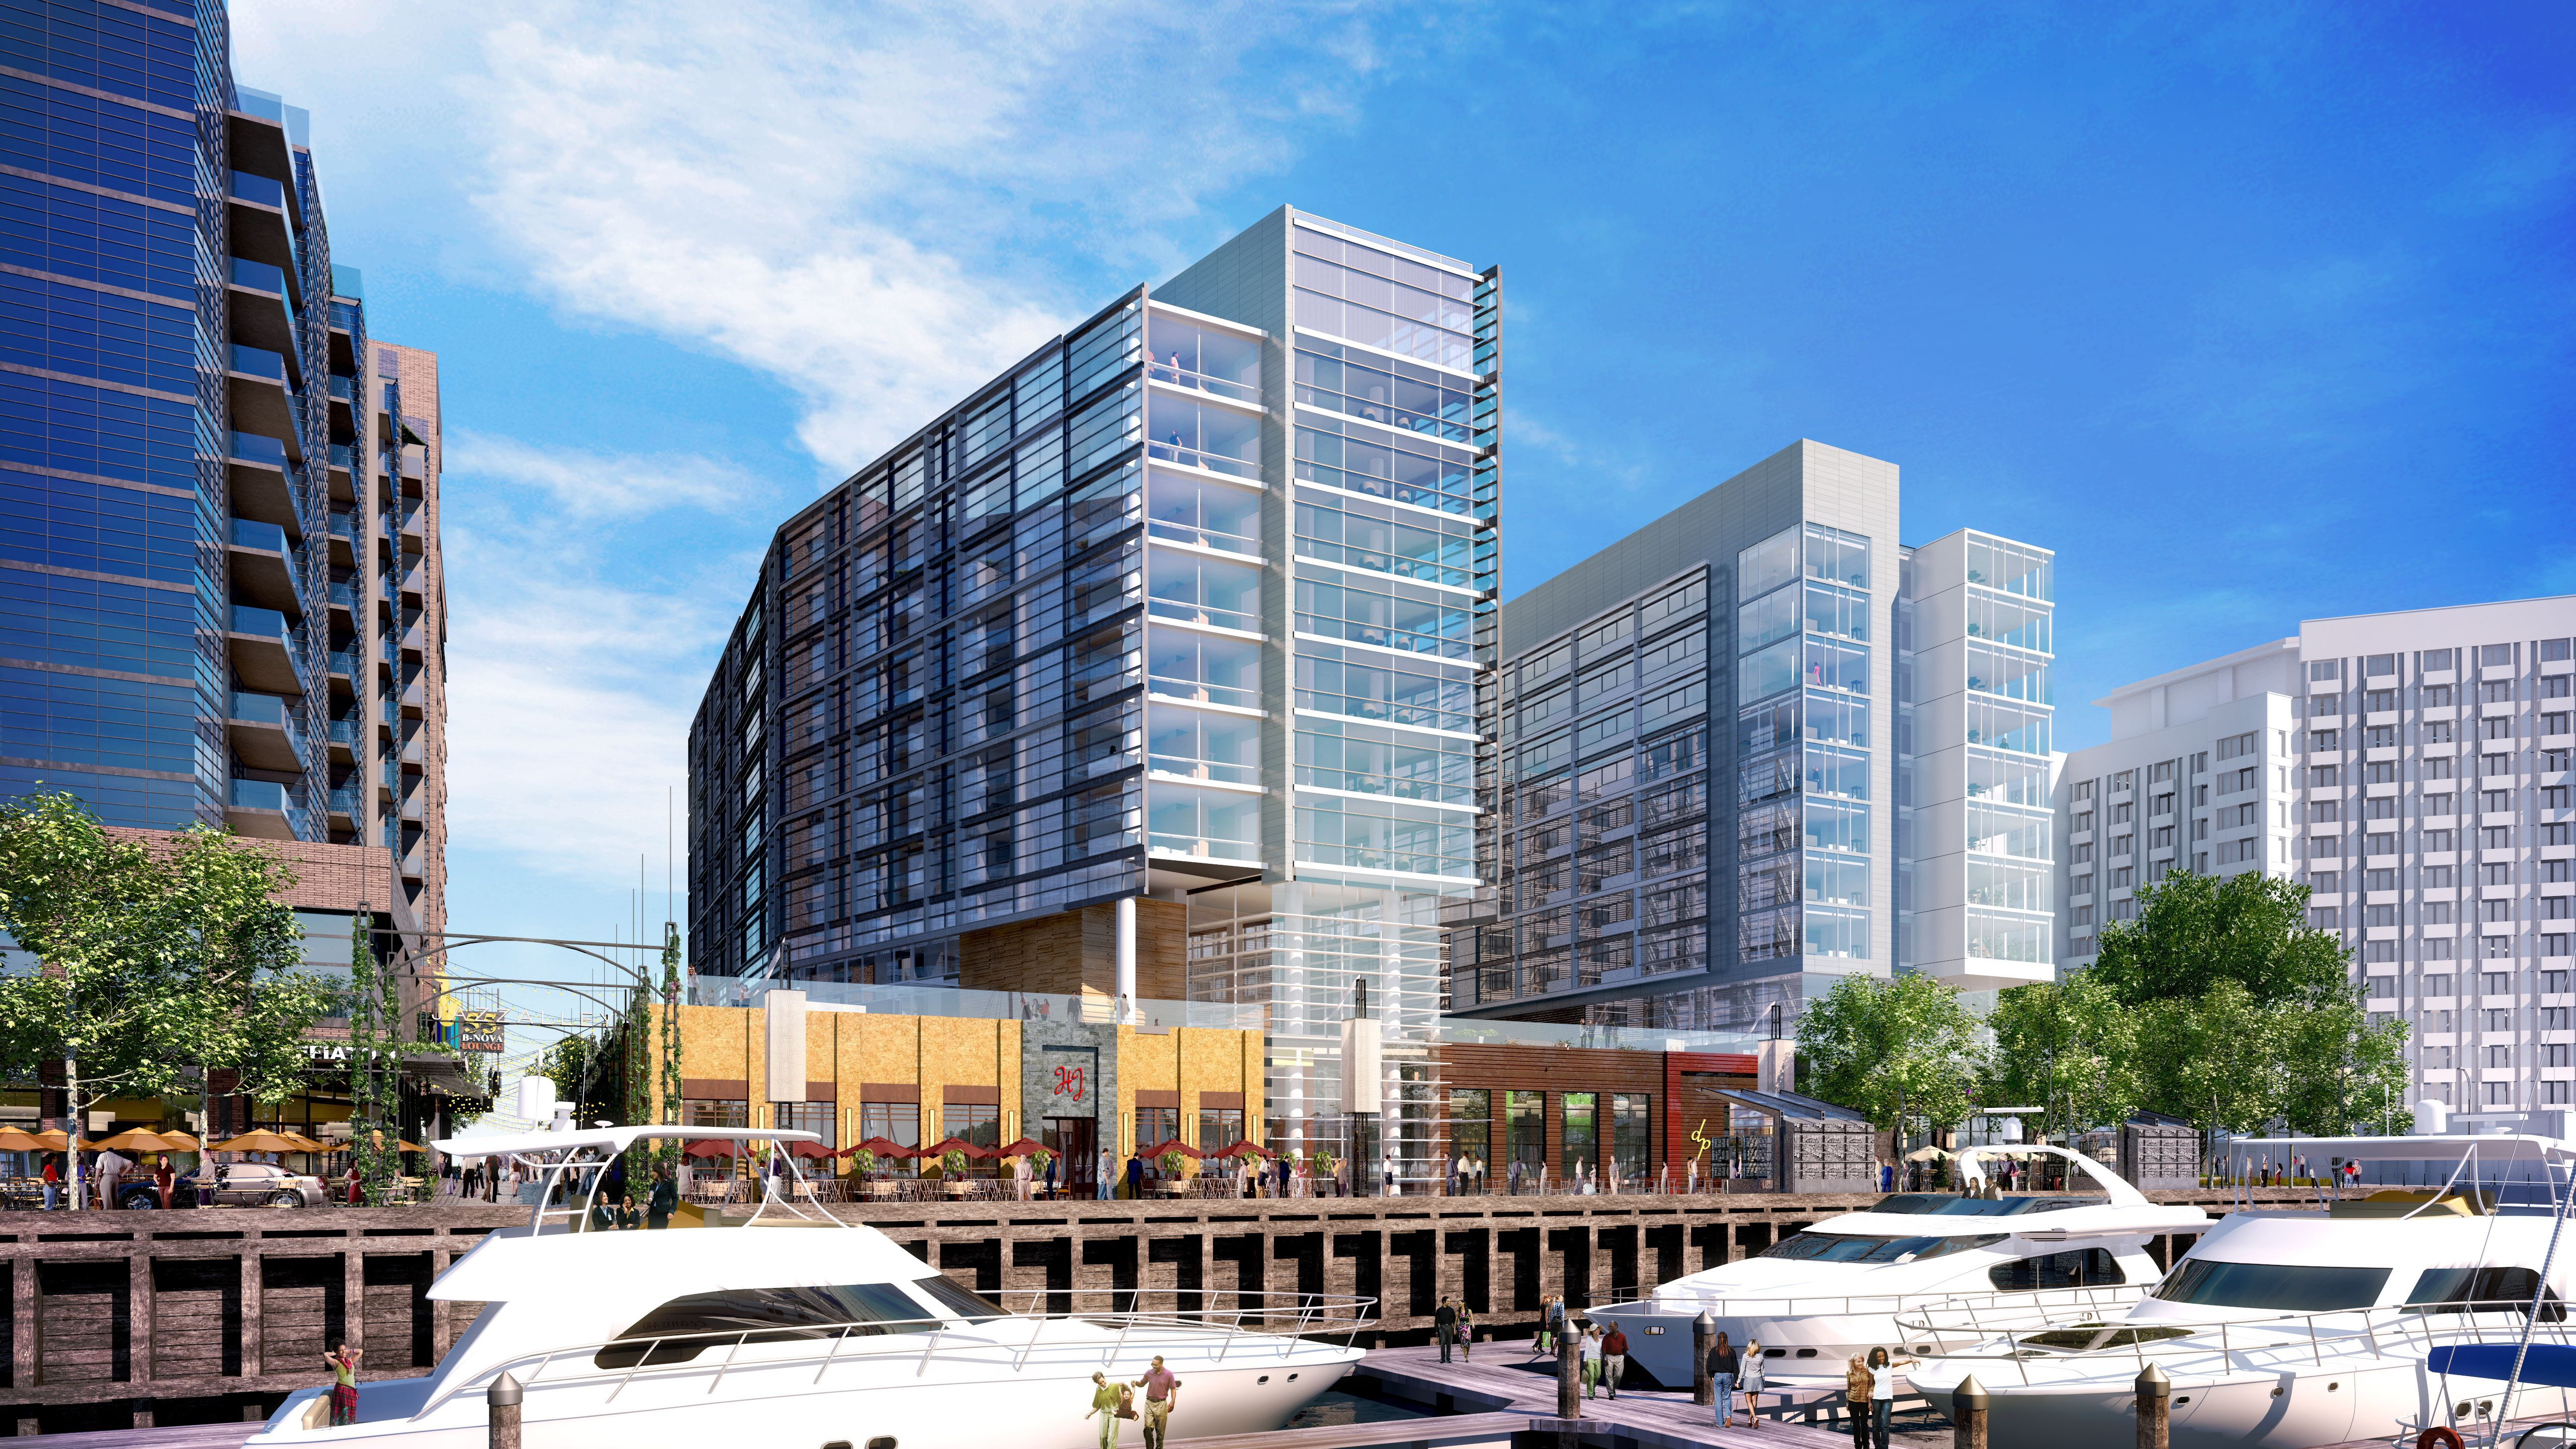 Rendering-Wharf-Shared-Hotel-Parcel.jpg